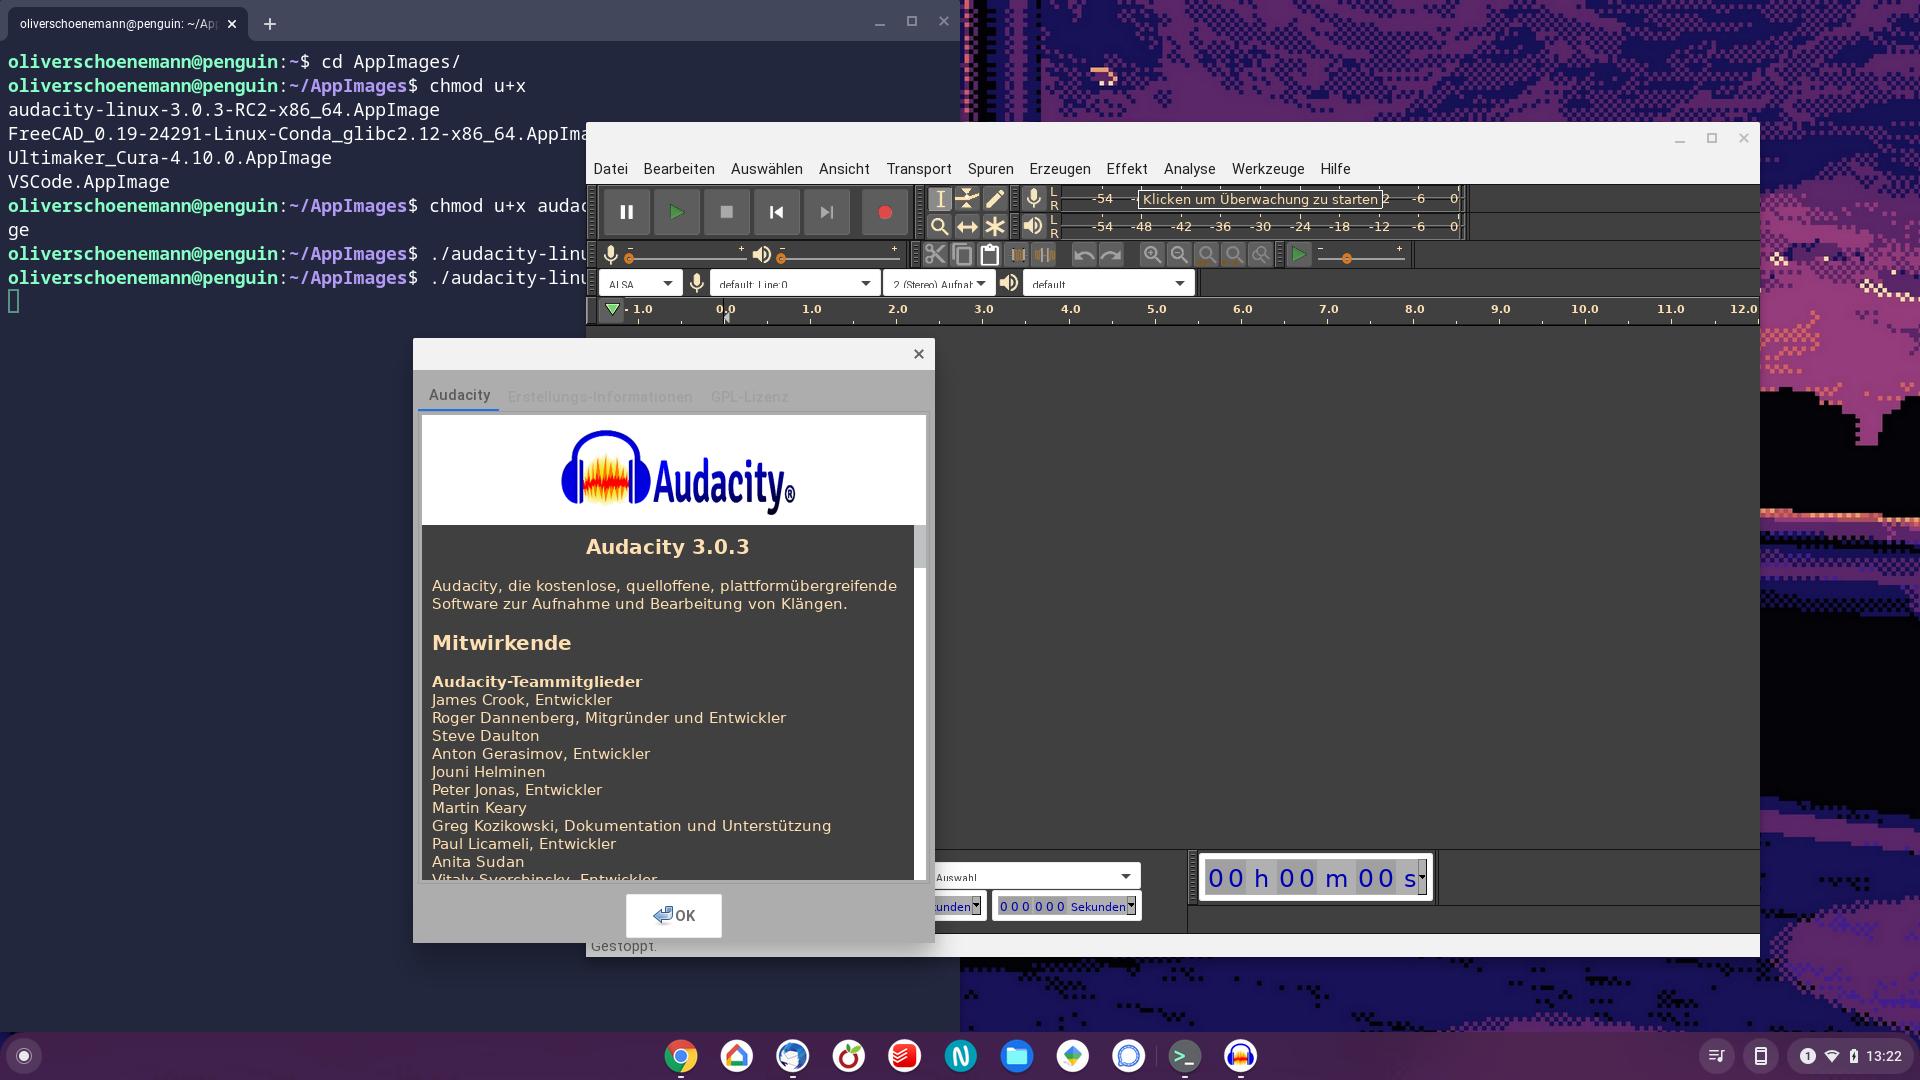 Audacity 3.0.3 RC auf ChromeBook